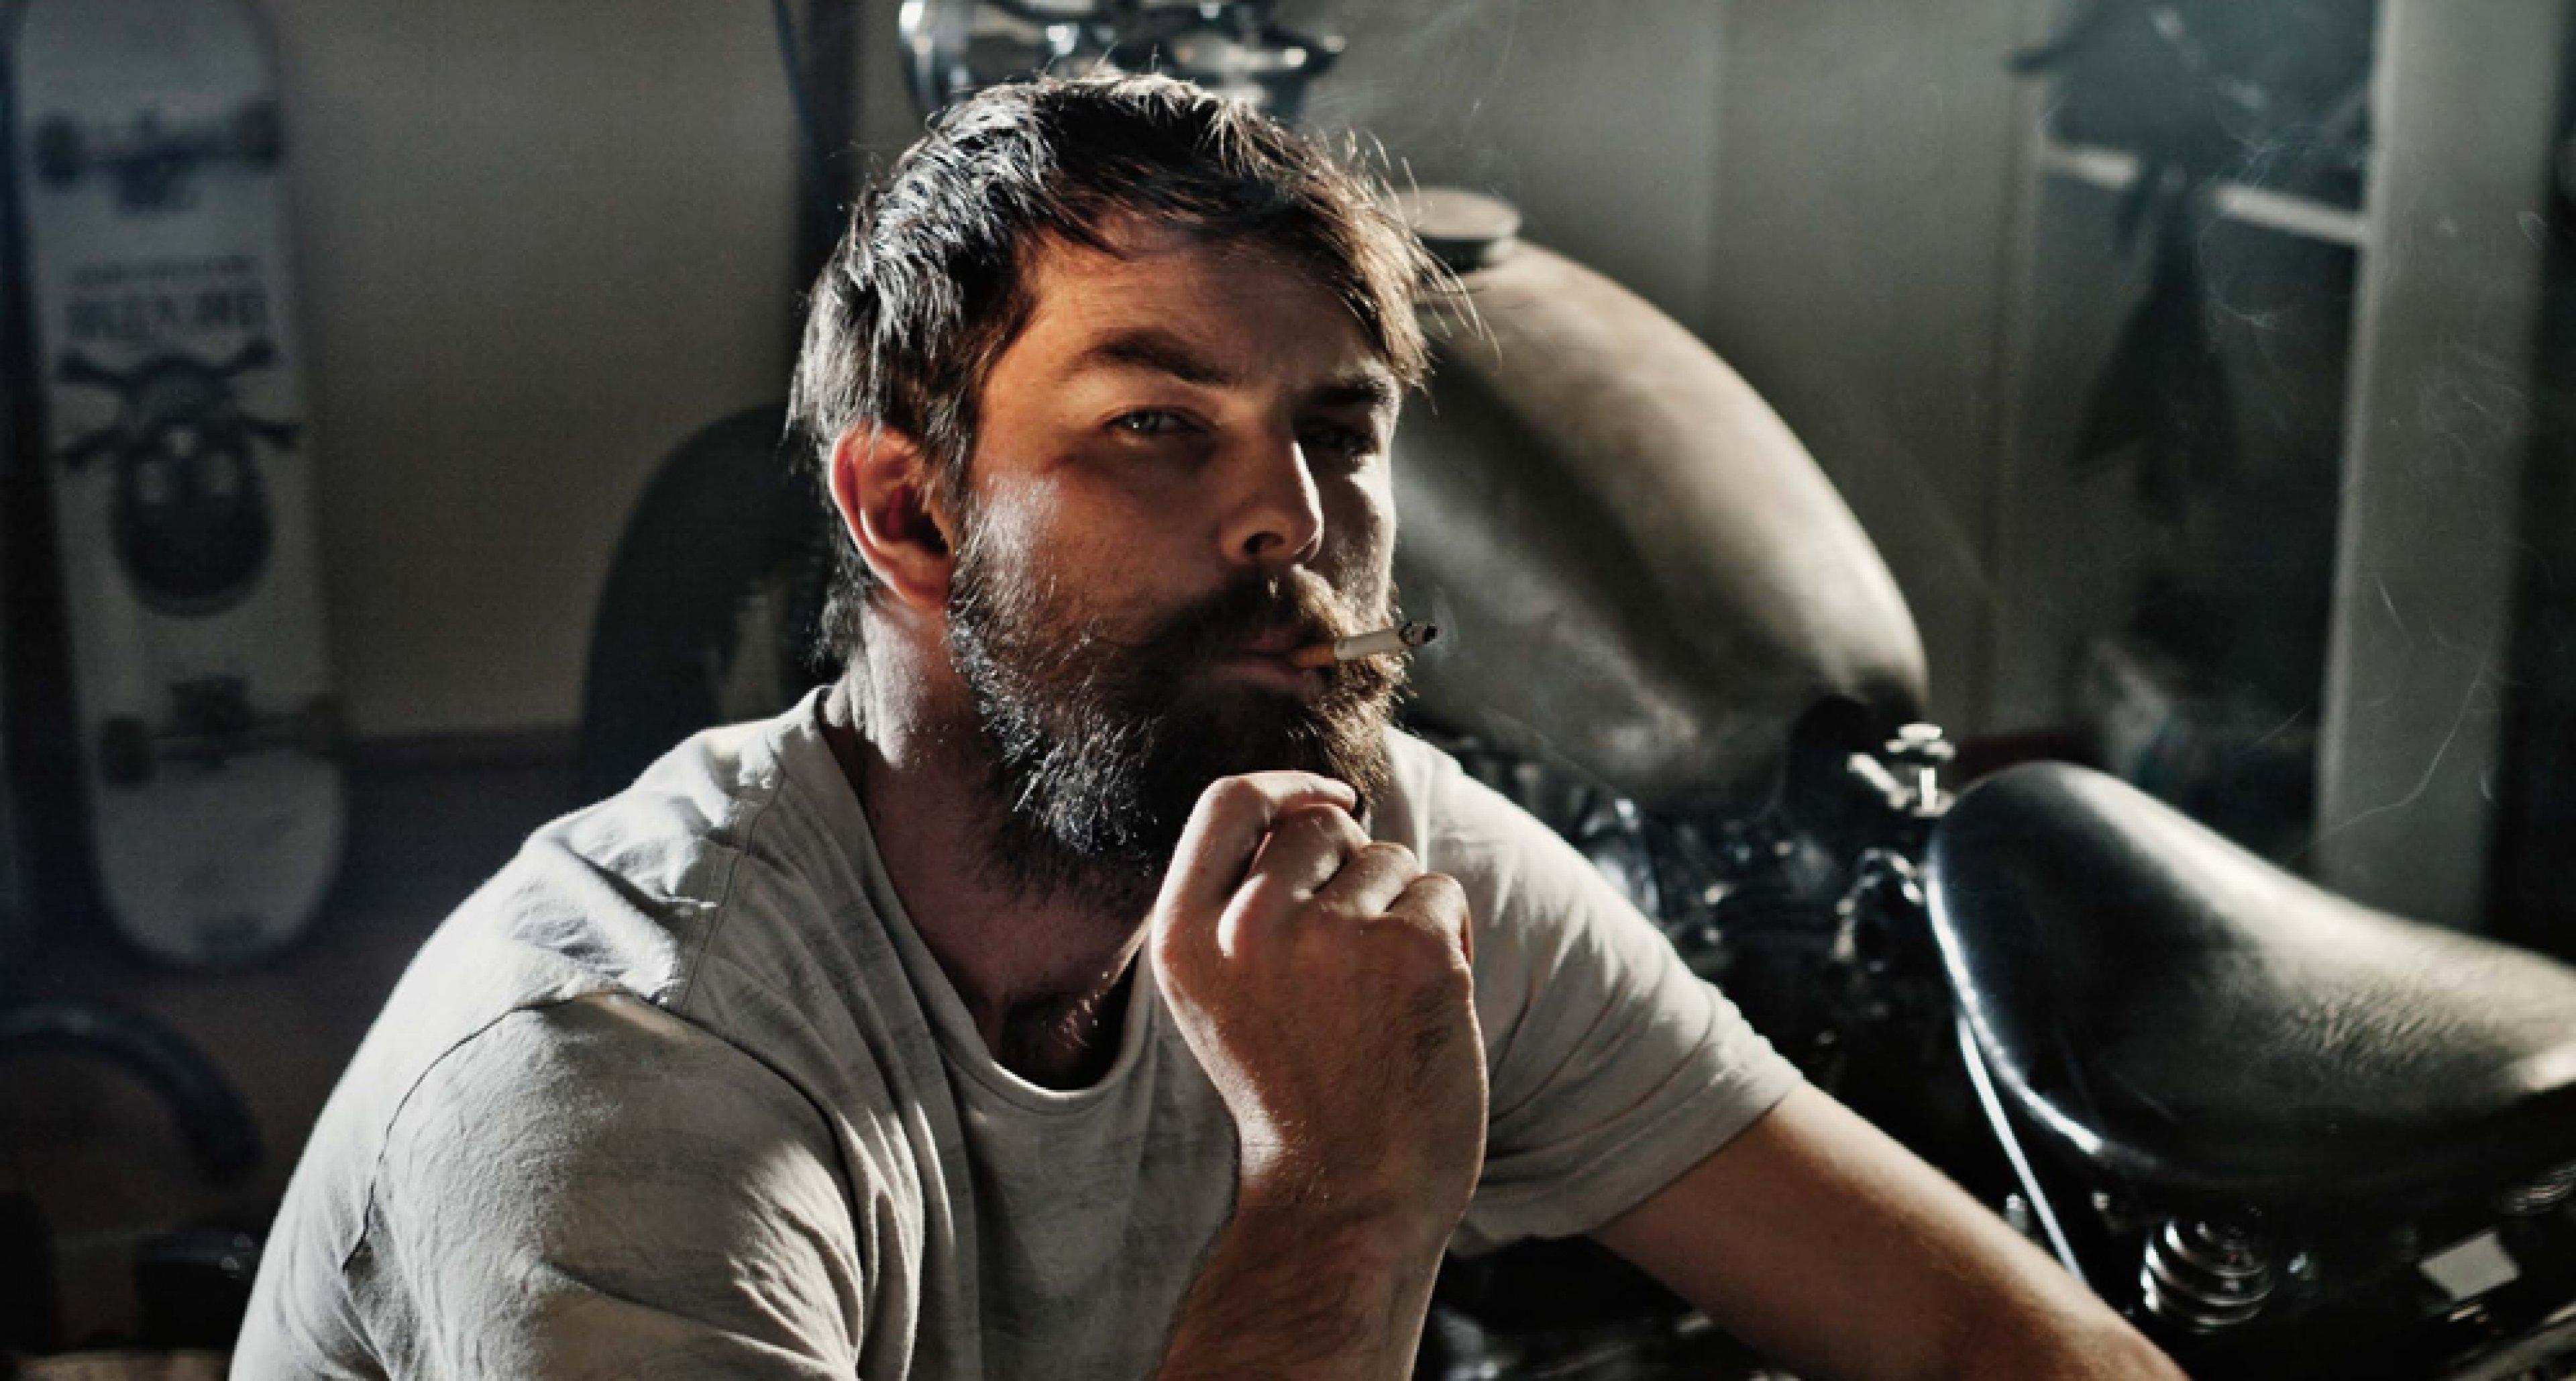 Motorcycle enthusiast James Jordan. Photo by Sam Christmas.